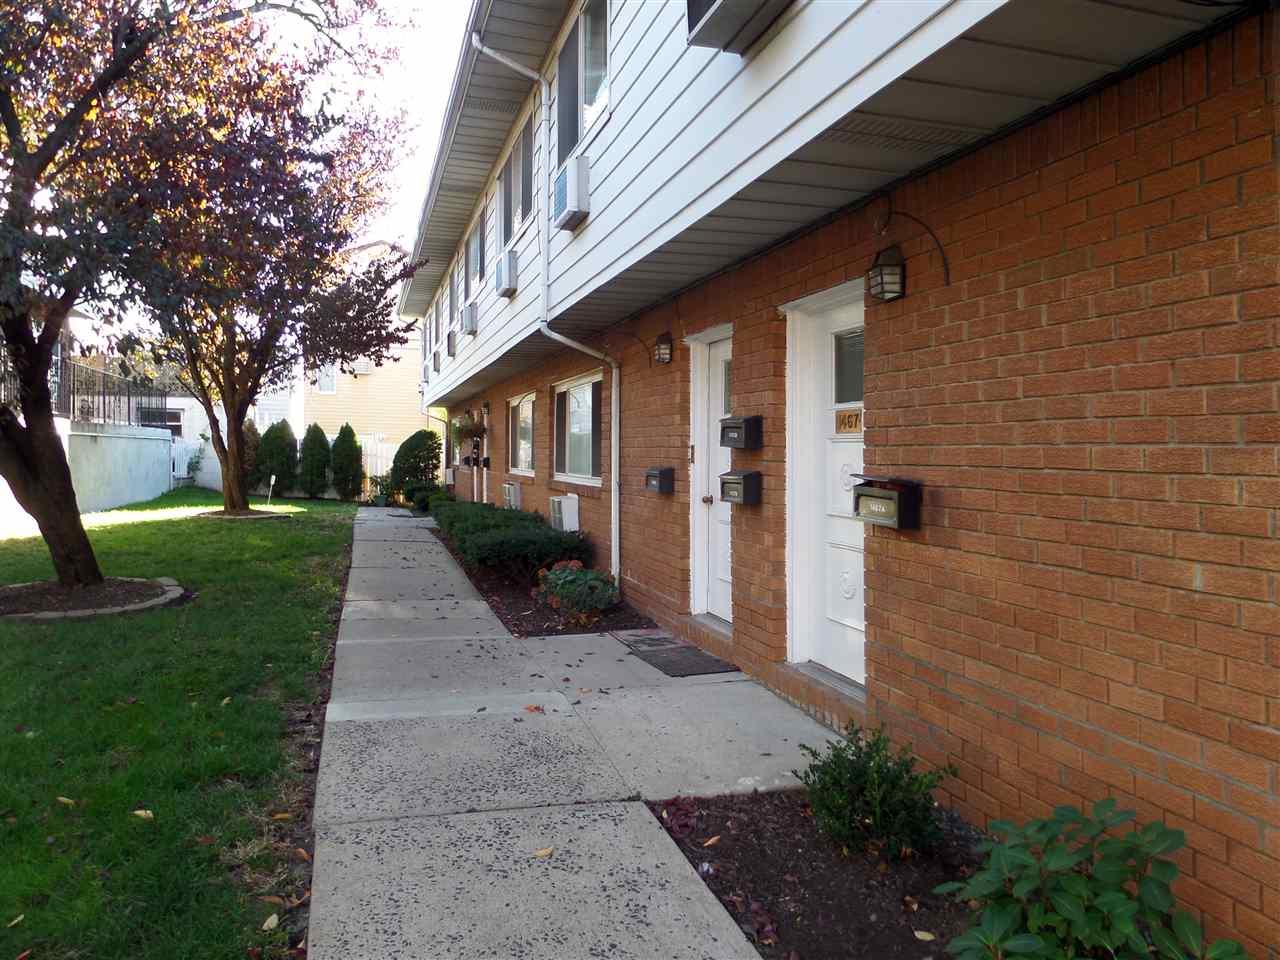 1465A 68TH ST 1-A, North Bergen, NJ 07047